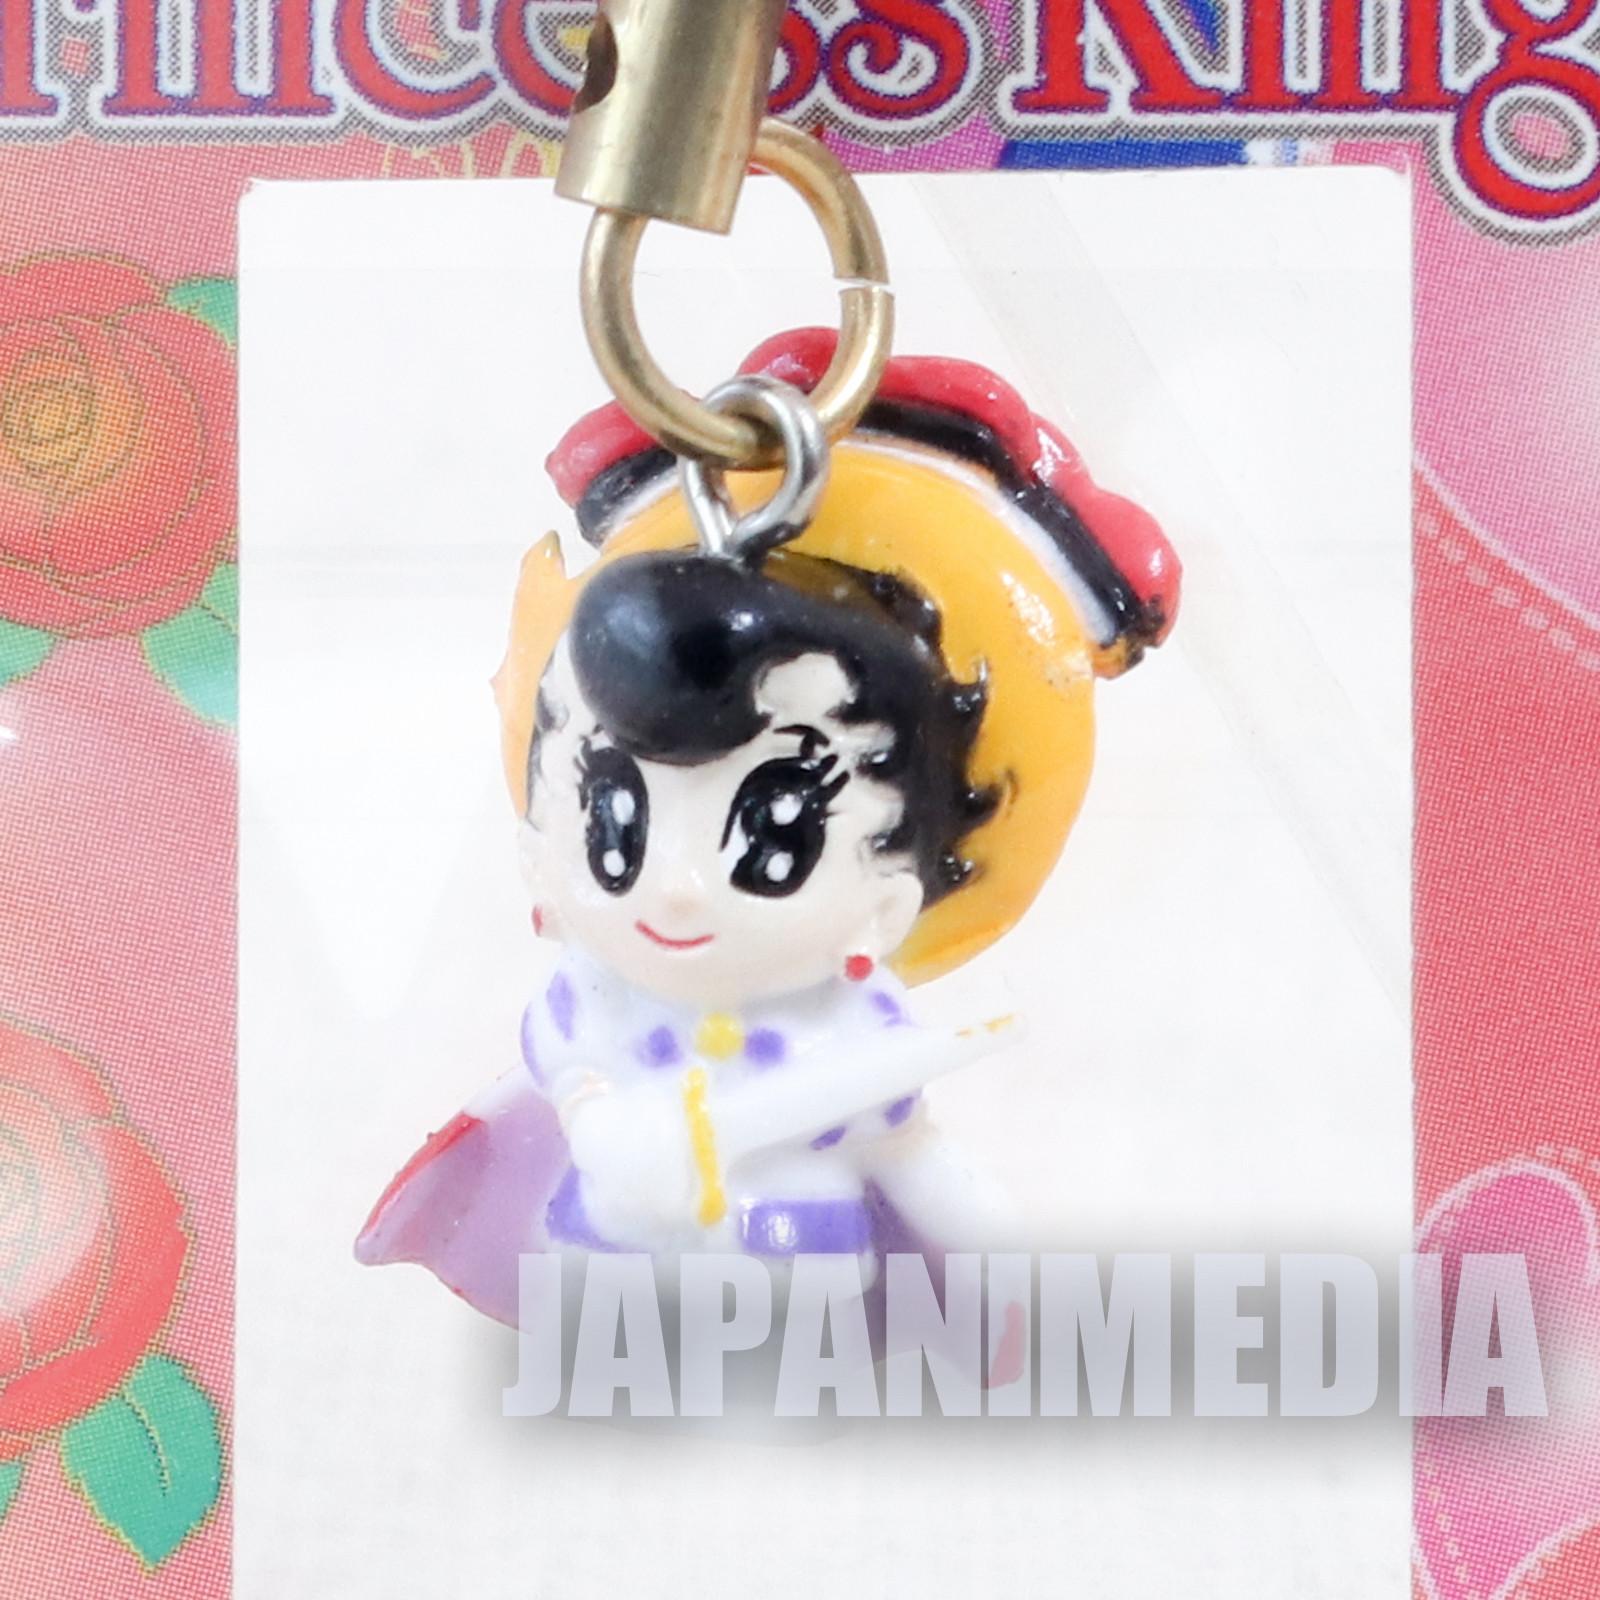 Princess Knight Sapphire Figure Strap #3 Osamu Tezuka JAPAN ANIME